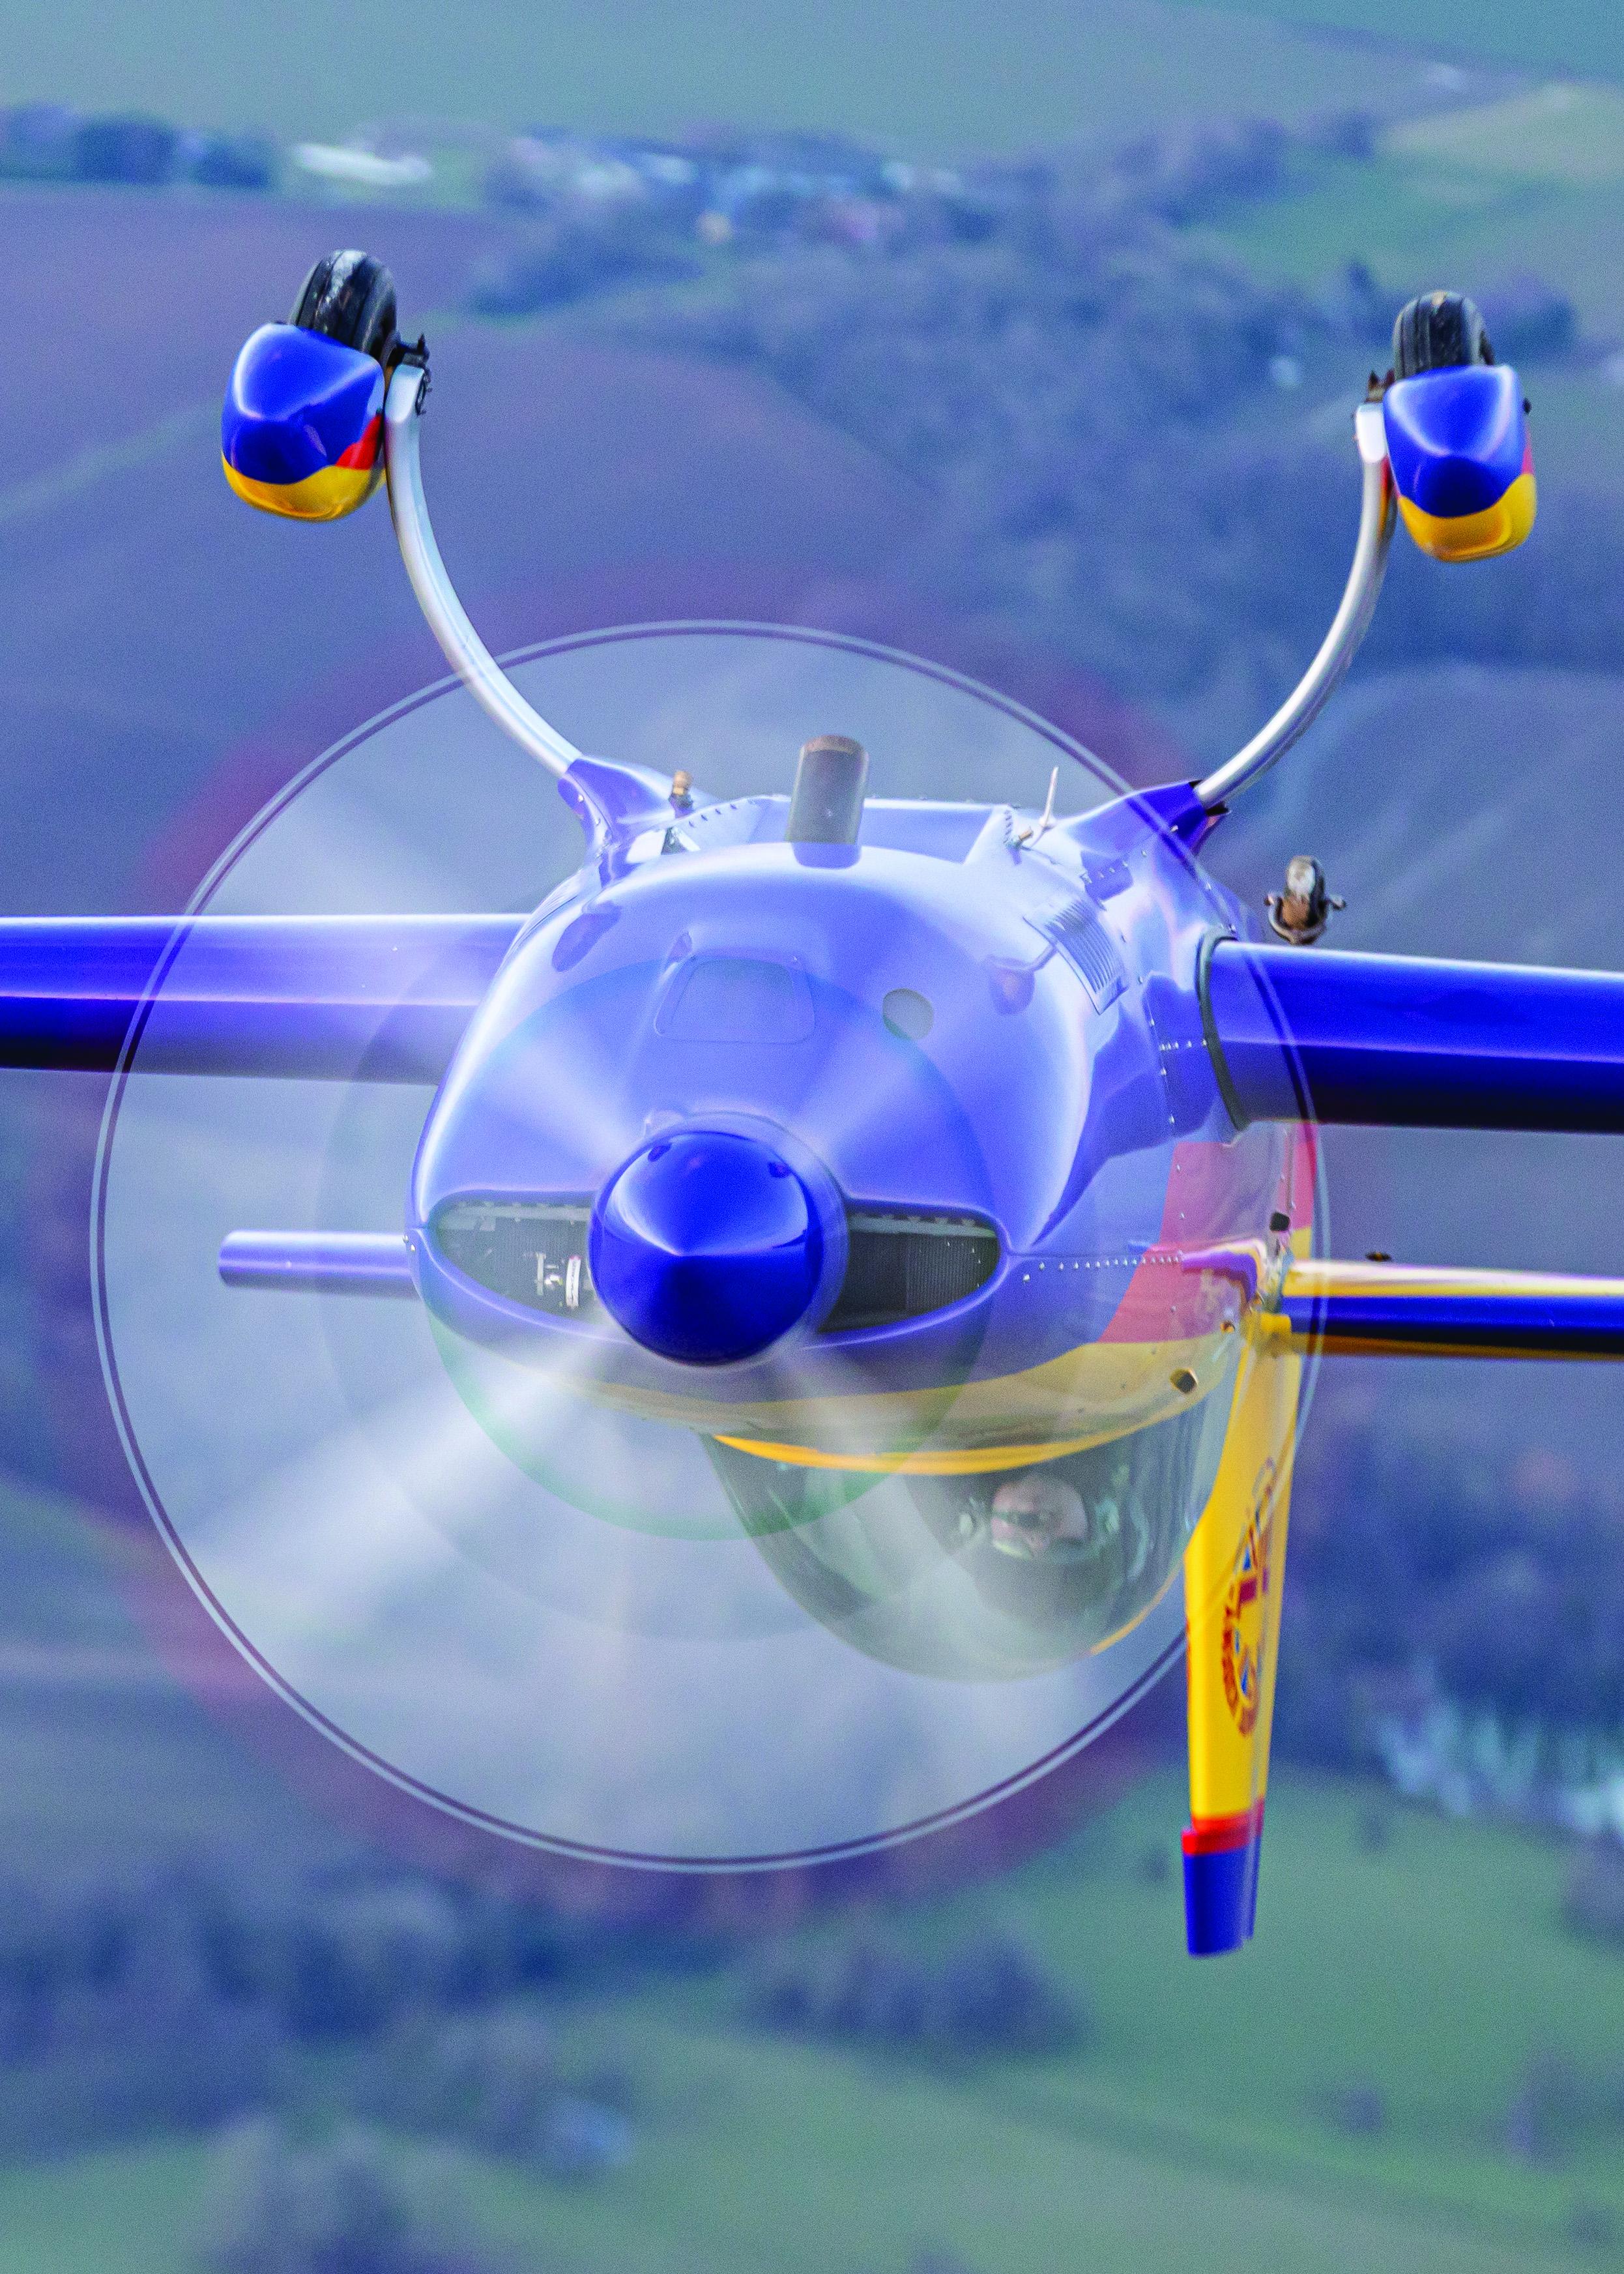 Aerobatic aircraft upside down in air